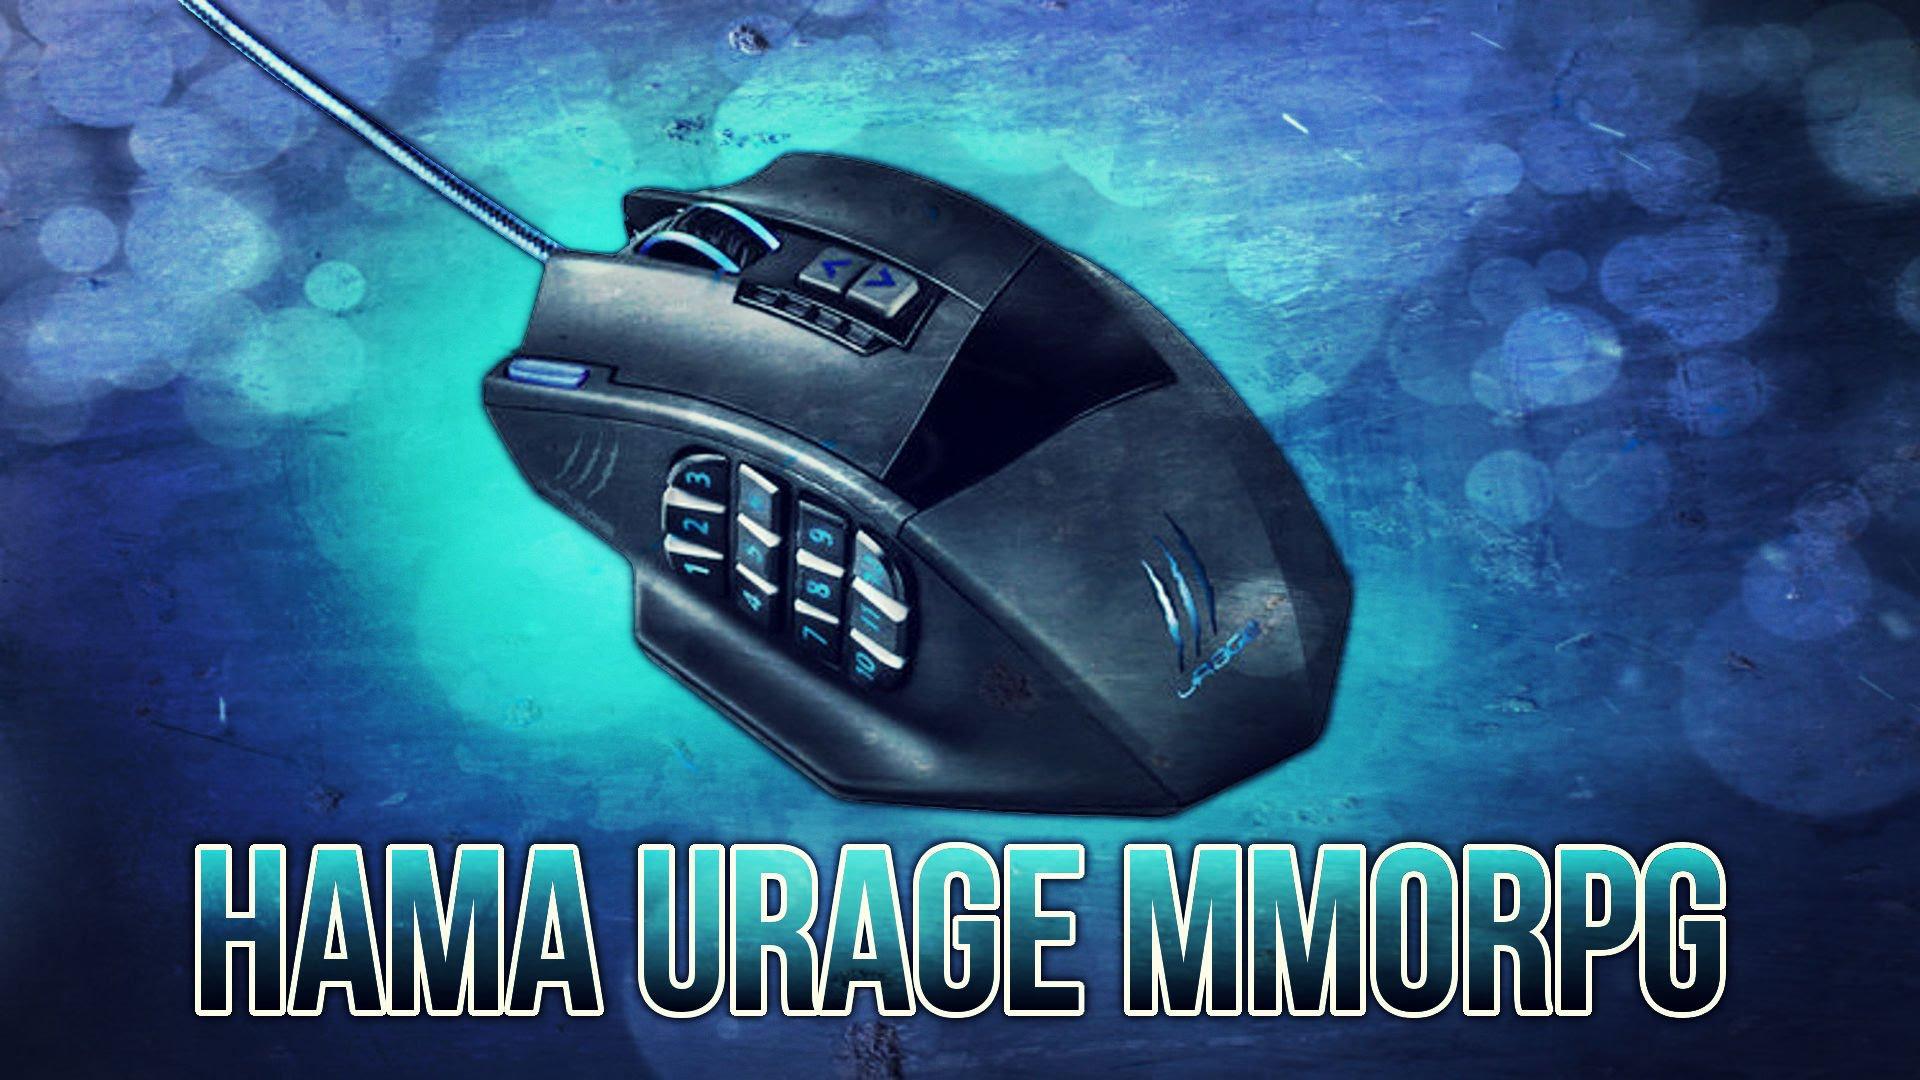 Hama uRAGE MMORPG